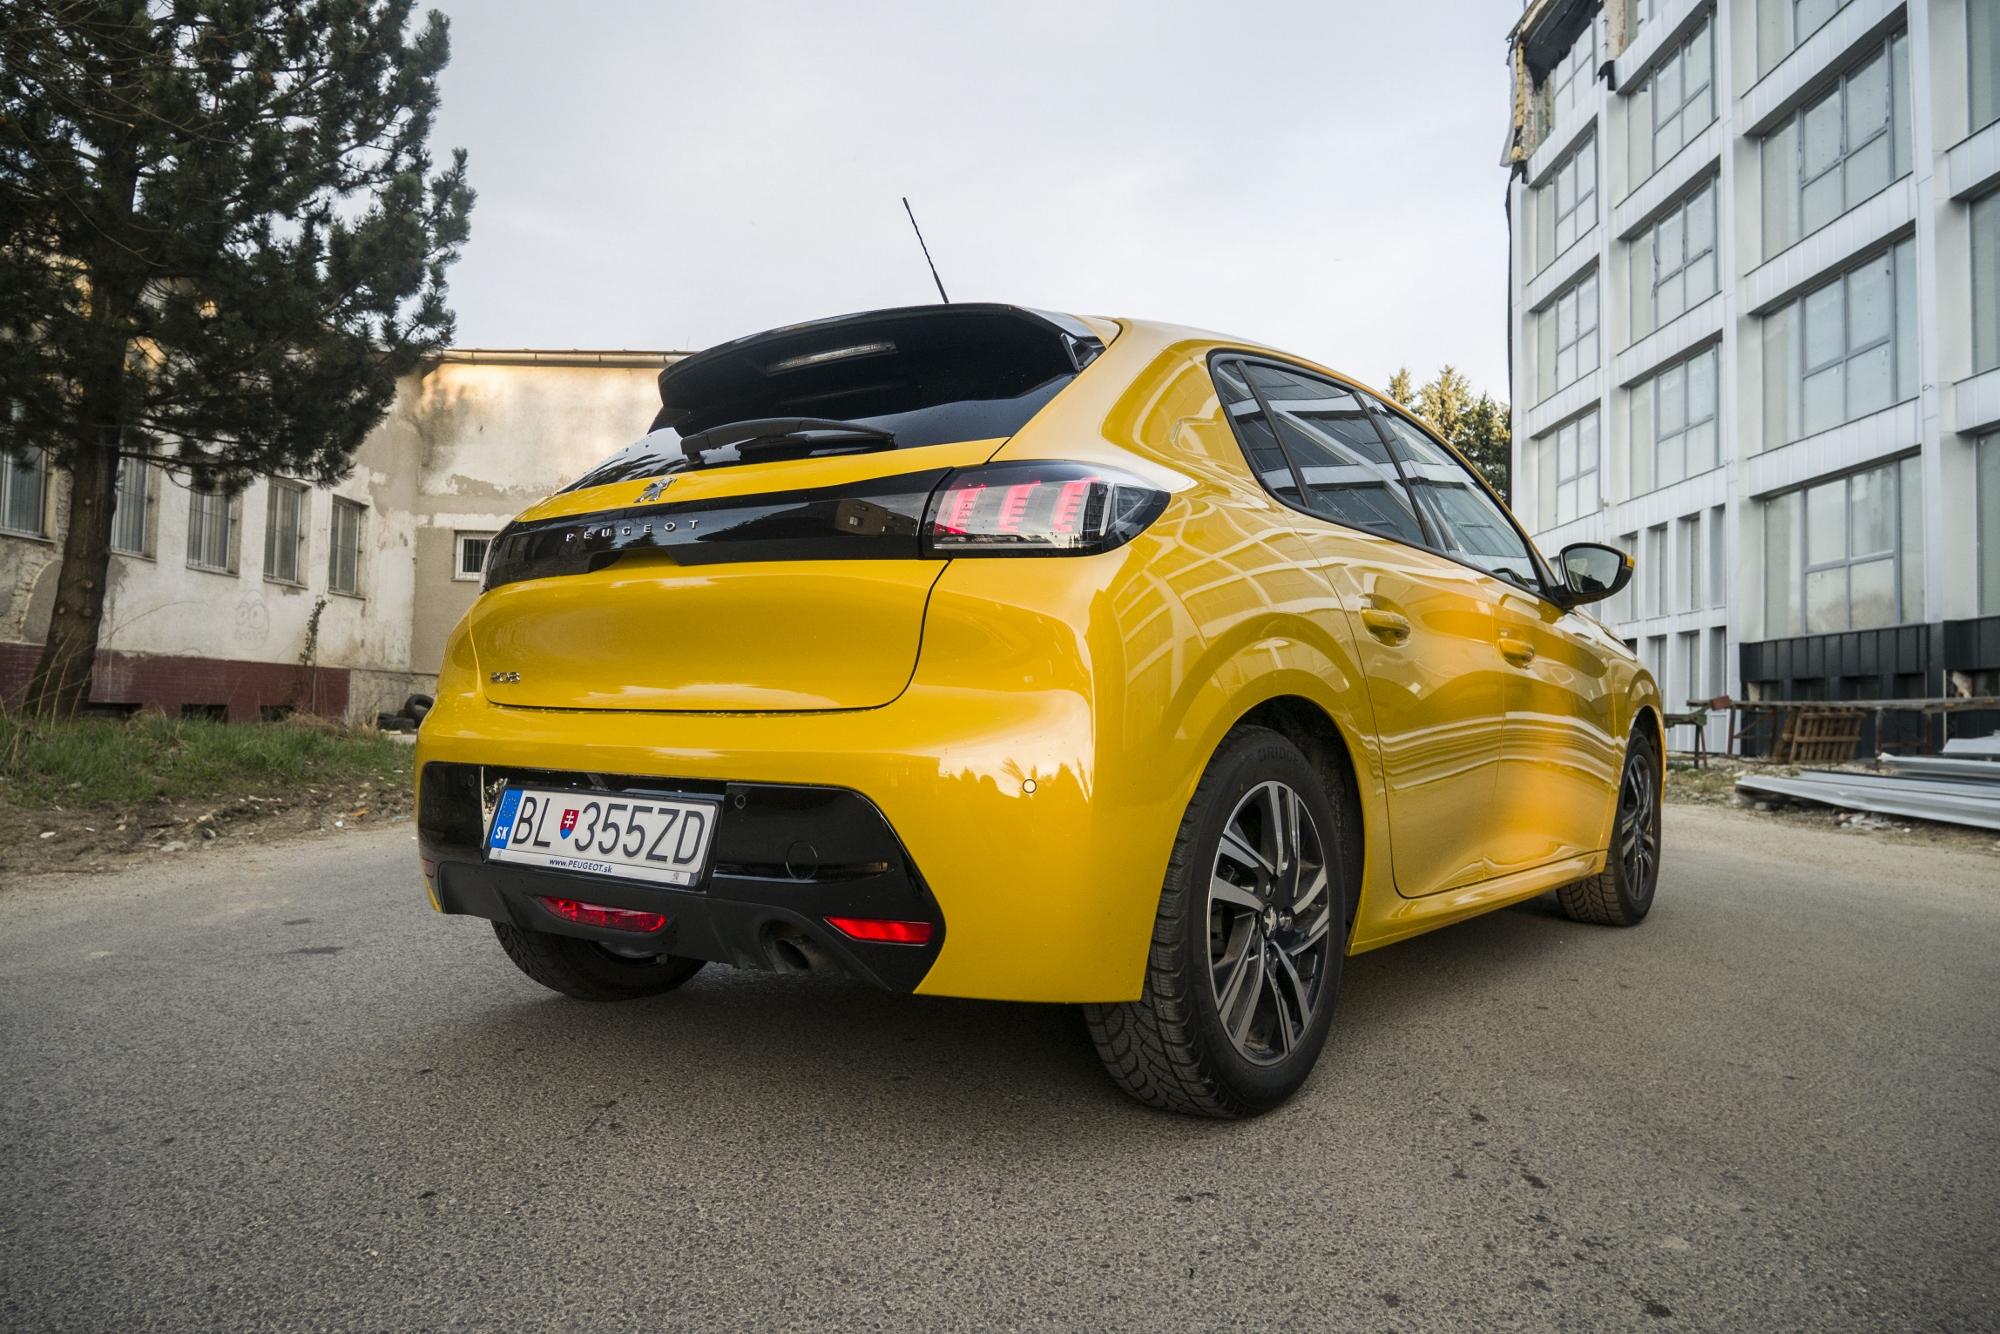 Test: Peugeot 208 prekvapivo pútal pohľady d7idiV2Nrr peugeot-208-15